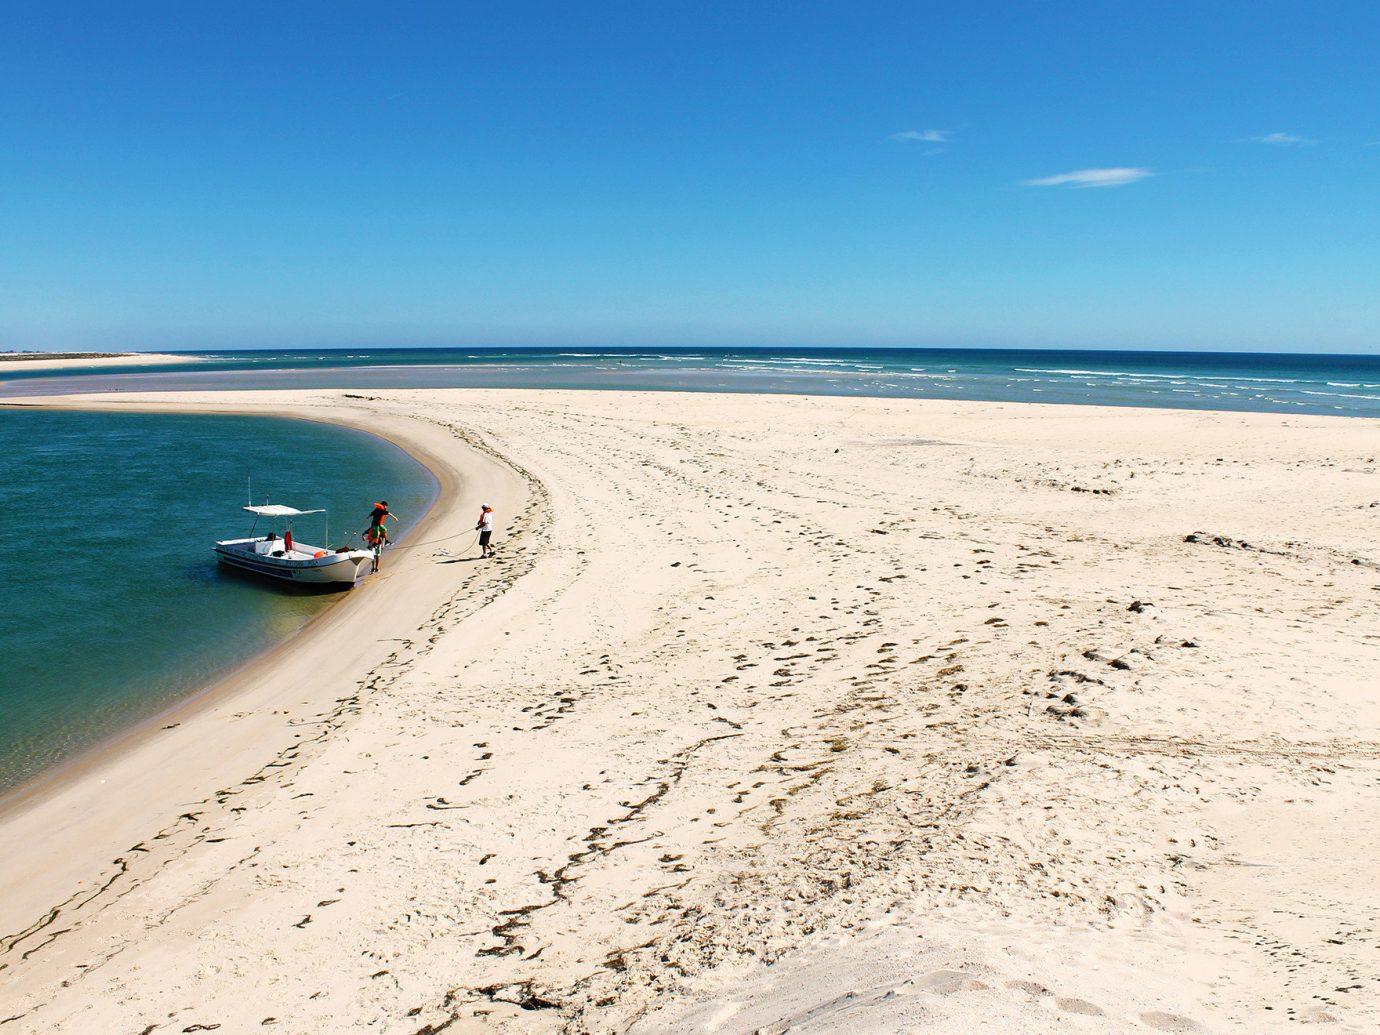 sky water outdoor Nature Beach shore Sea coastal and oceanic landforms Ocean sand horizon Coast vacation wave sandy